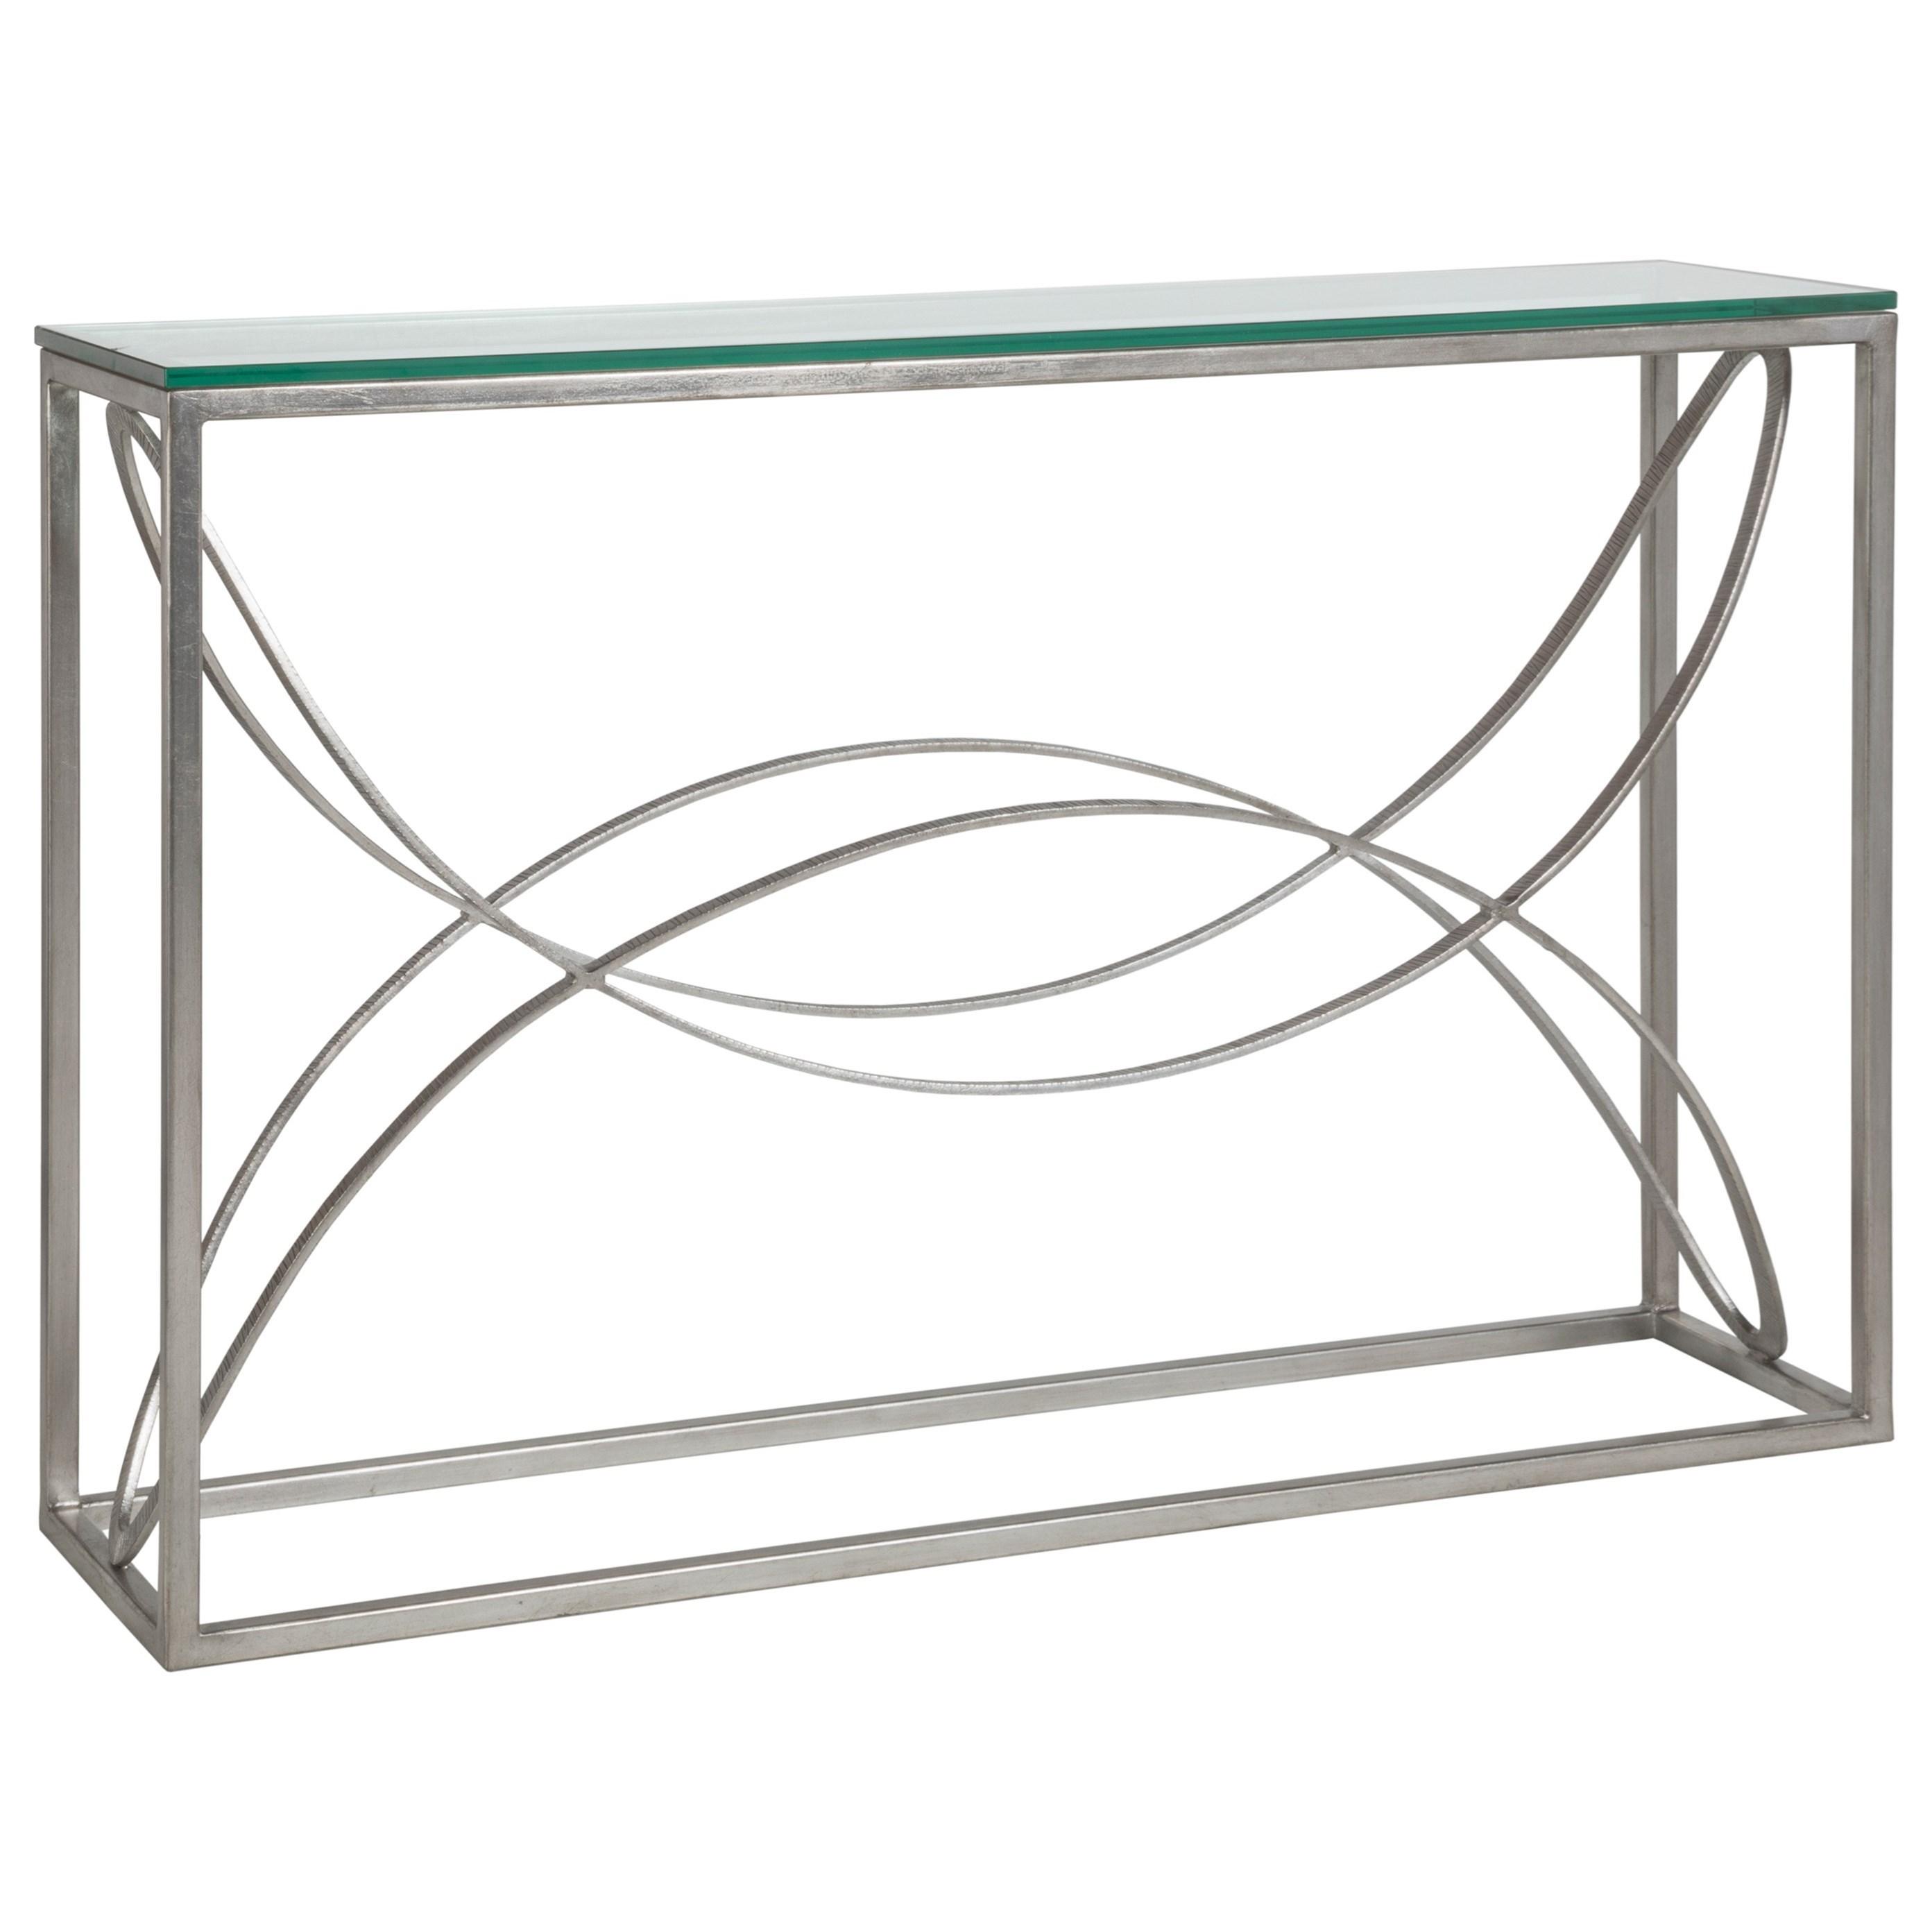 Metal Designs Ellipse Console by Artistica at Baer's Furniture